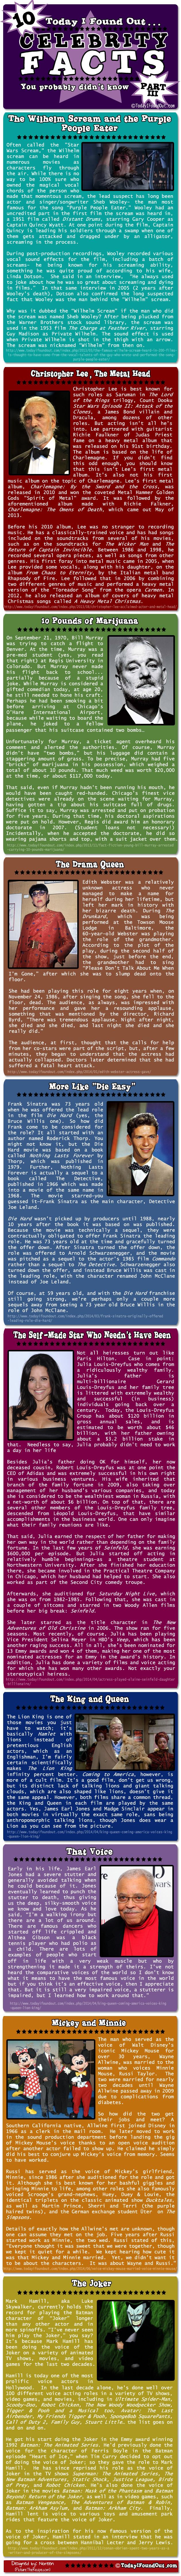 Celebrity Facts- Part 3